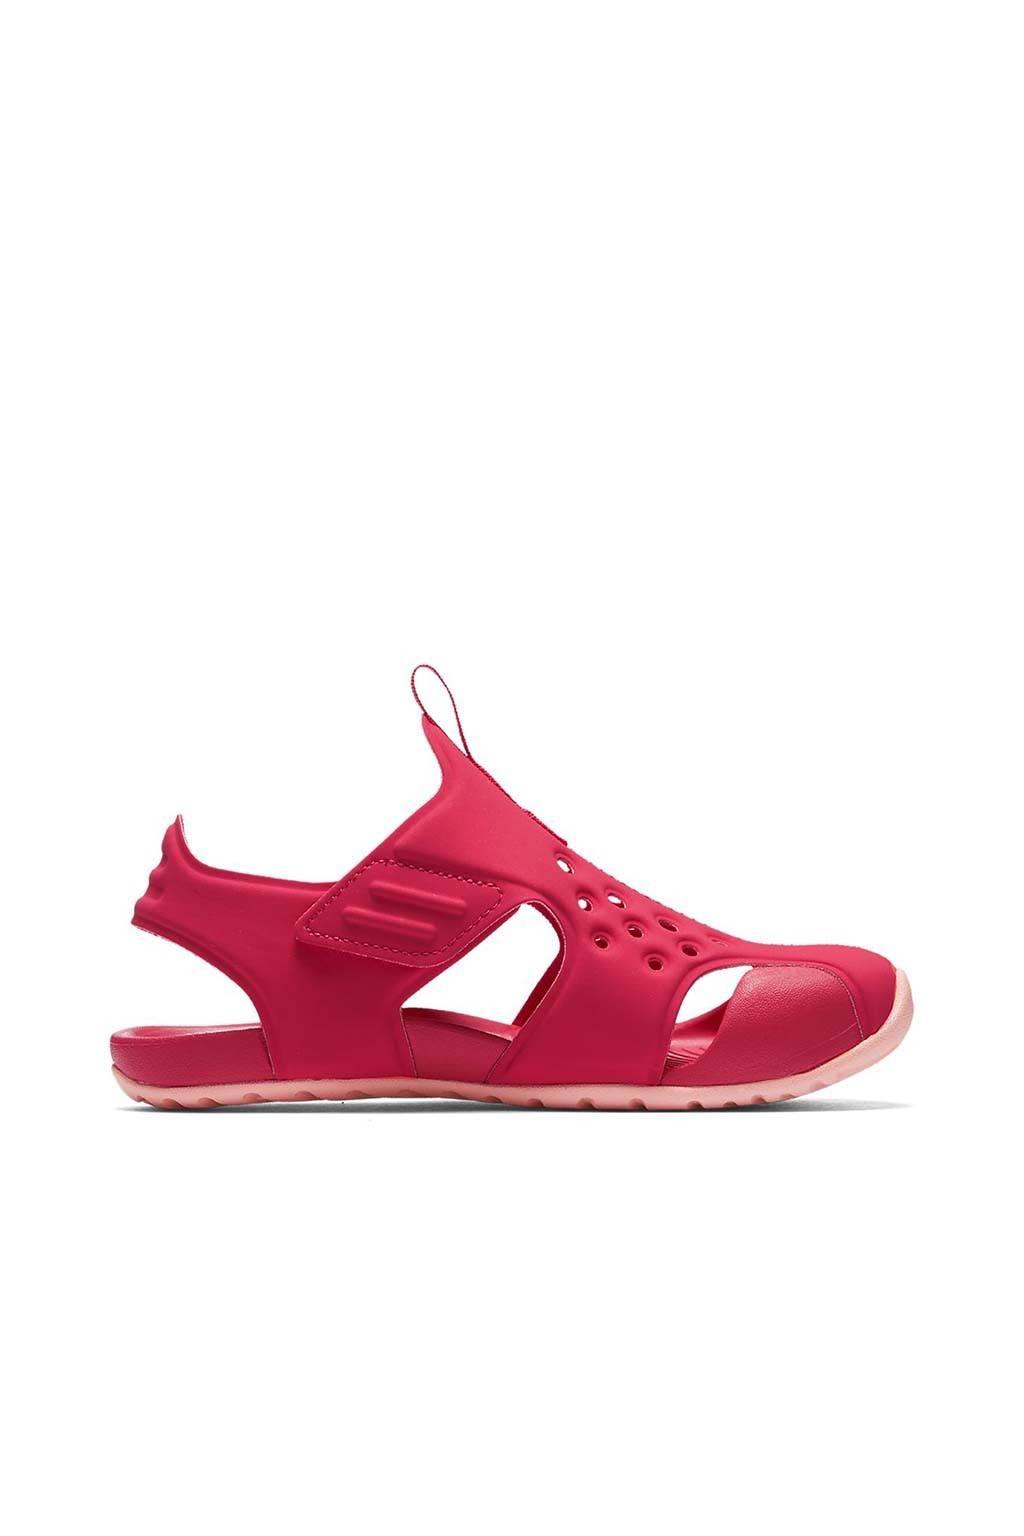 2766cdc89d ... real nike sunray protect 943828 600 433d0 9b2ad usa kids nike sunray  protect ps sandals pinknike shoes forcheap ...